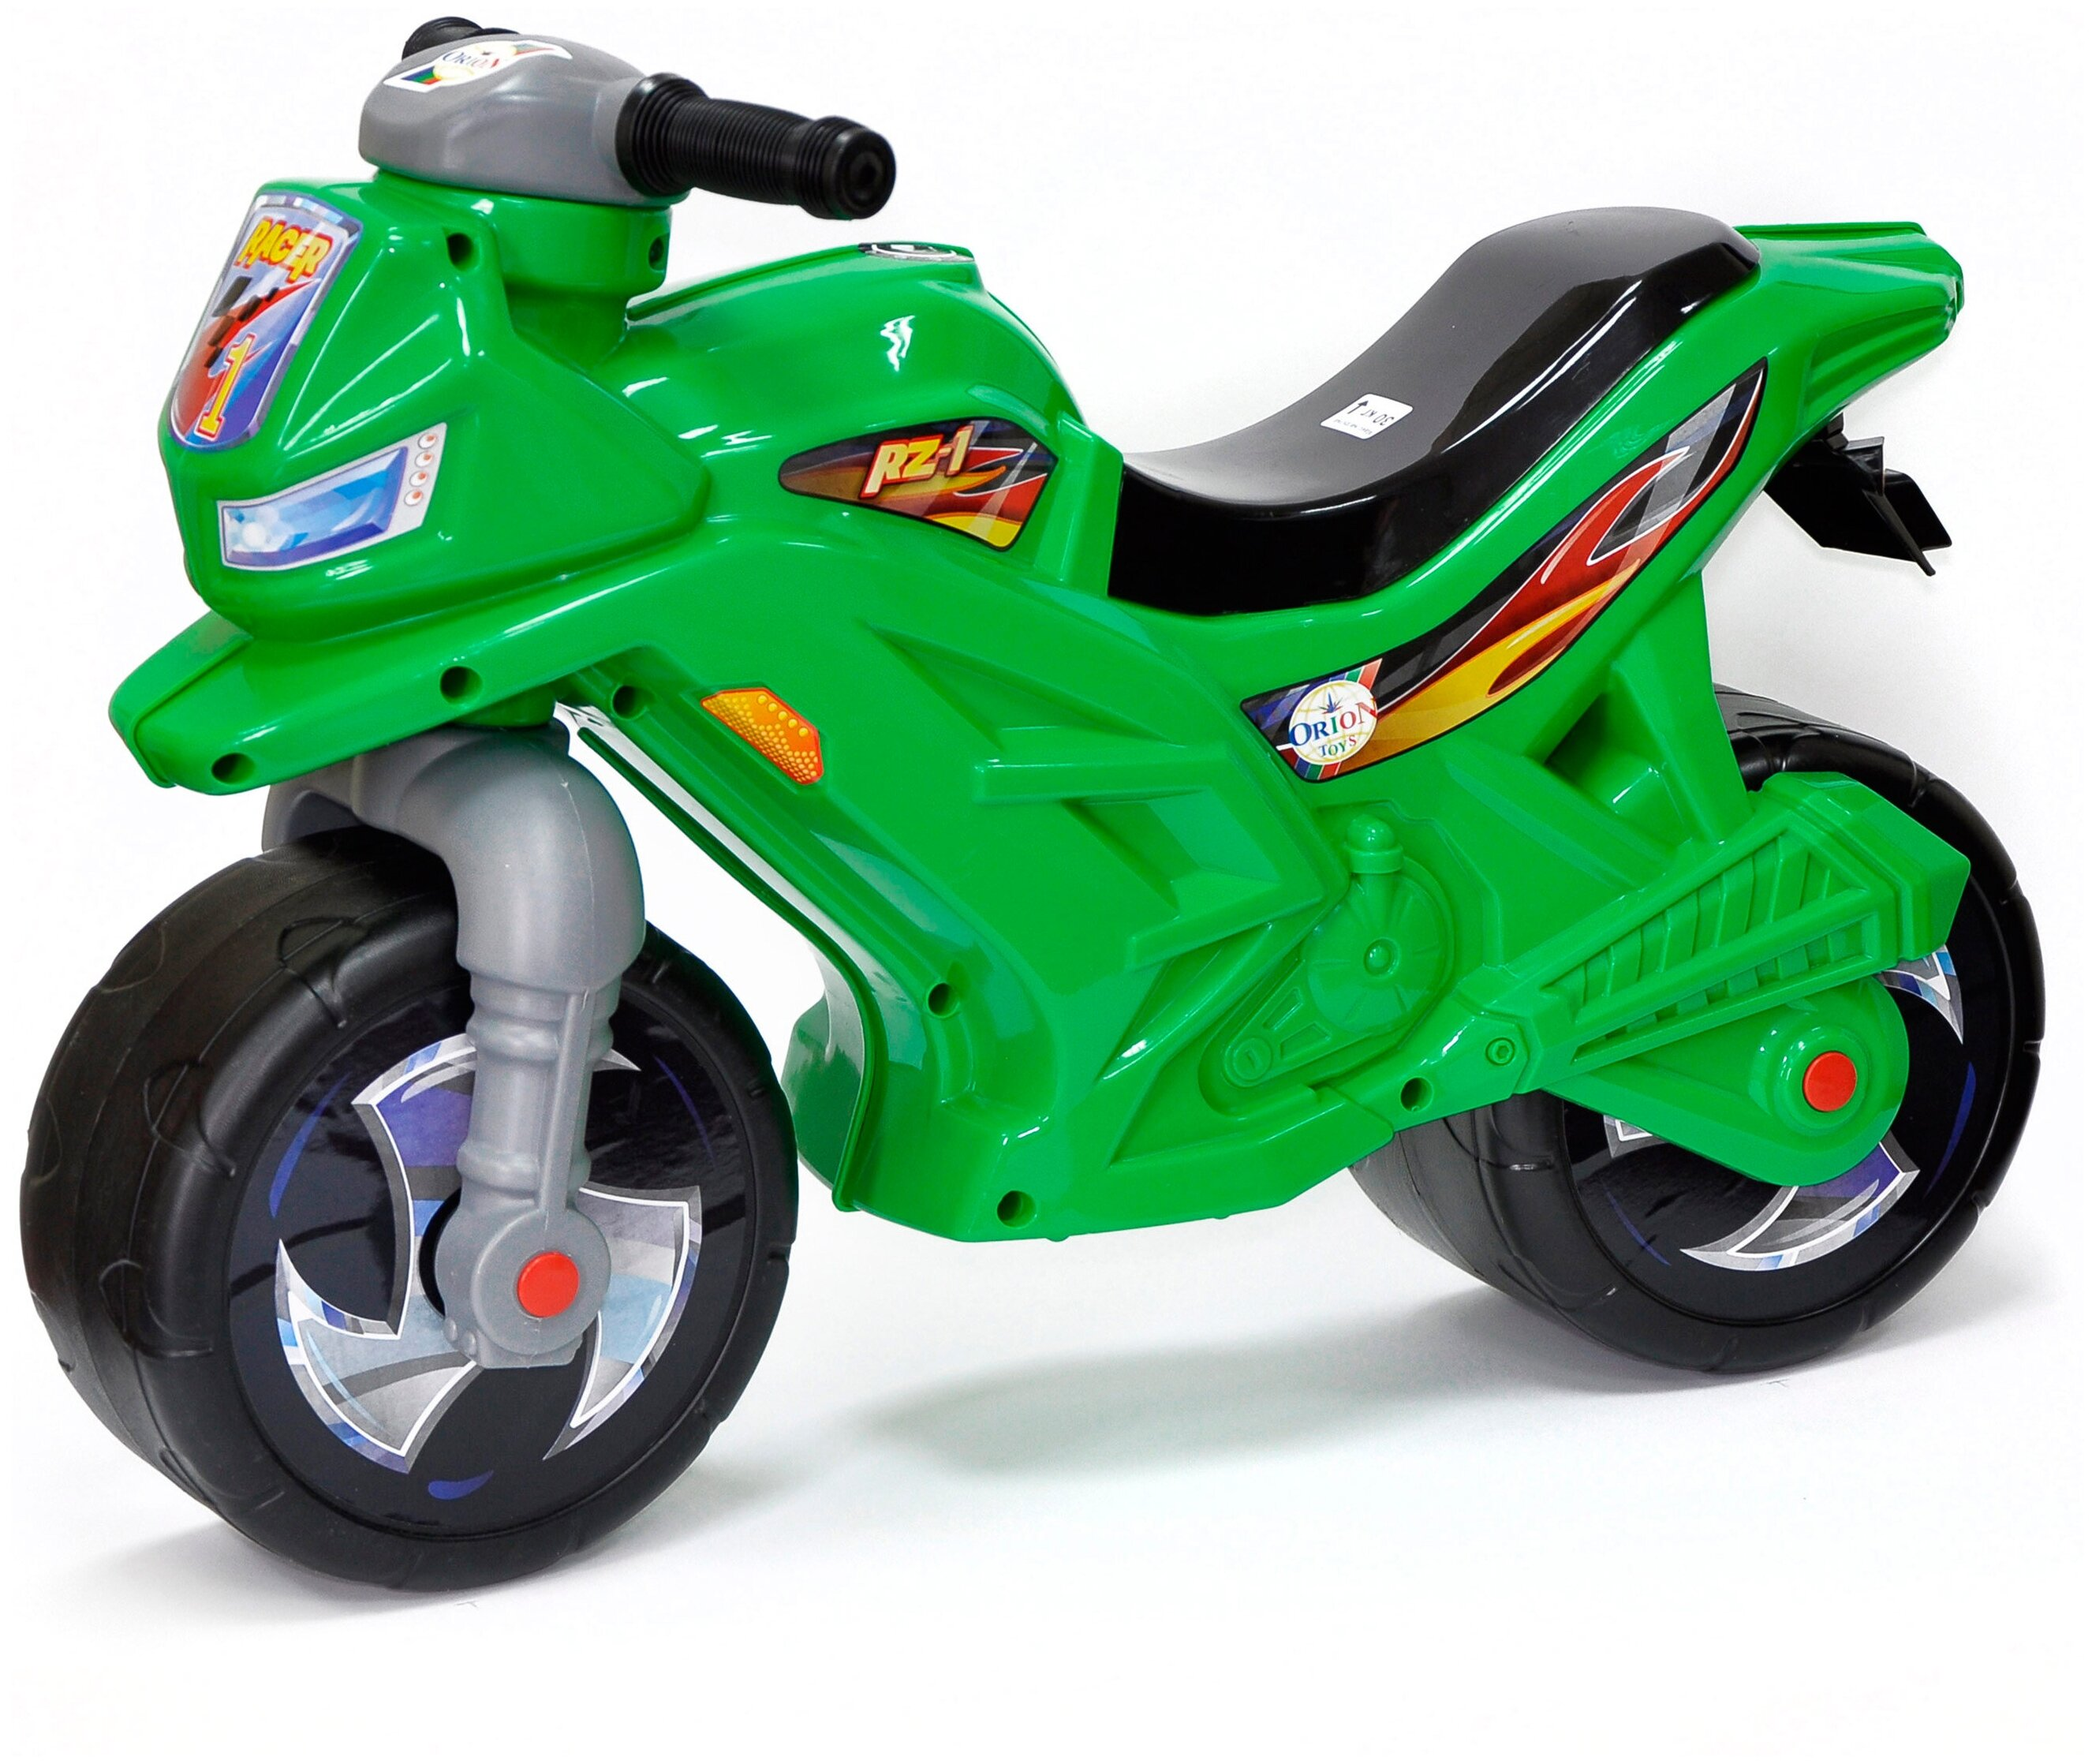 Orion Toys Мотоцикл 2-х колесный - вид: мотоцикл